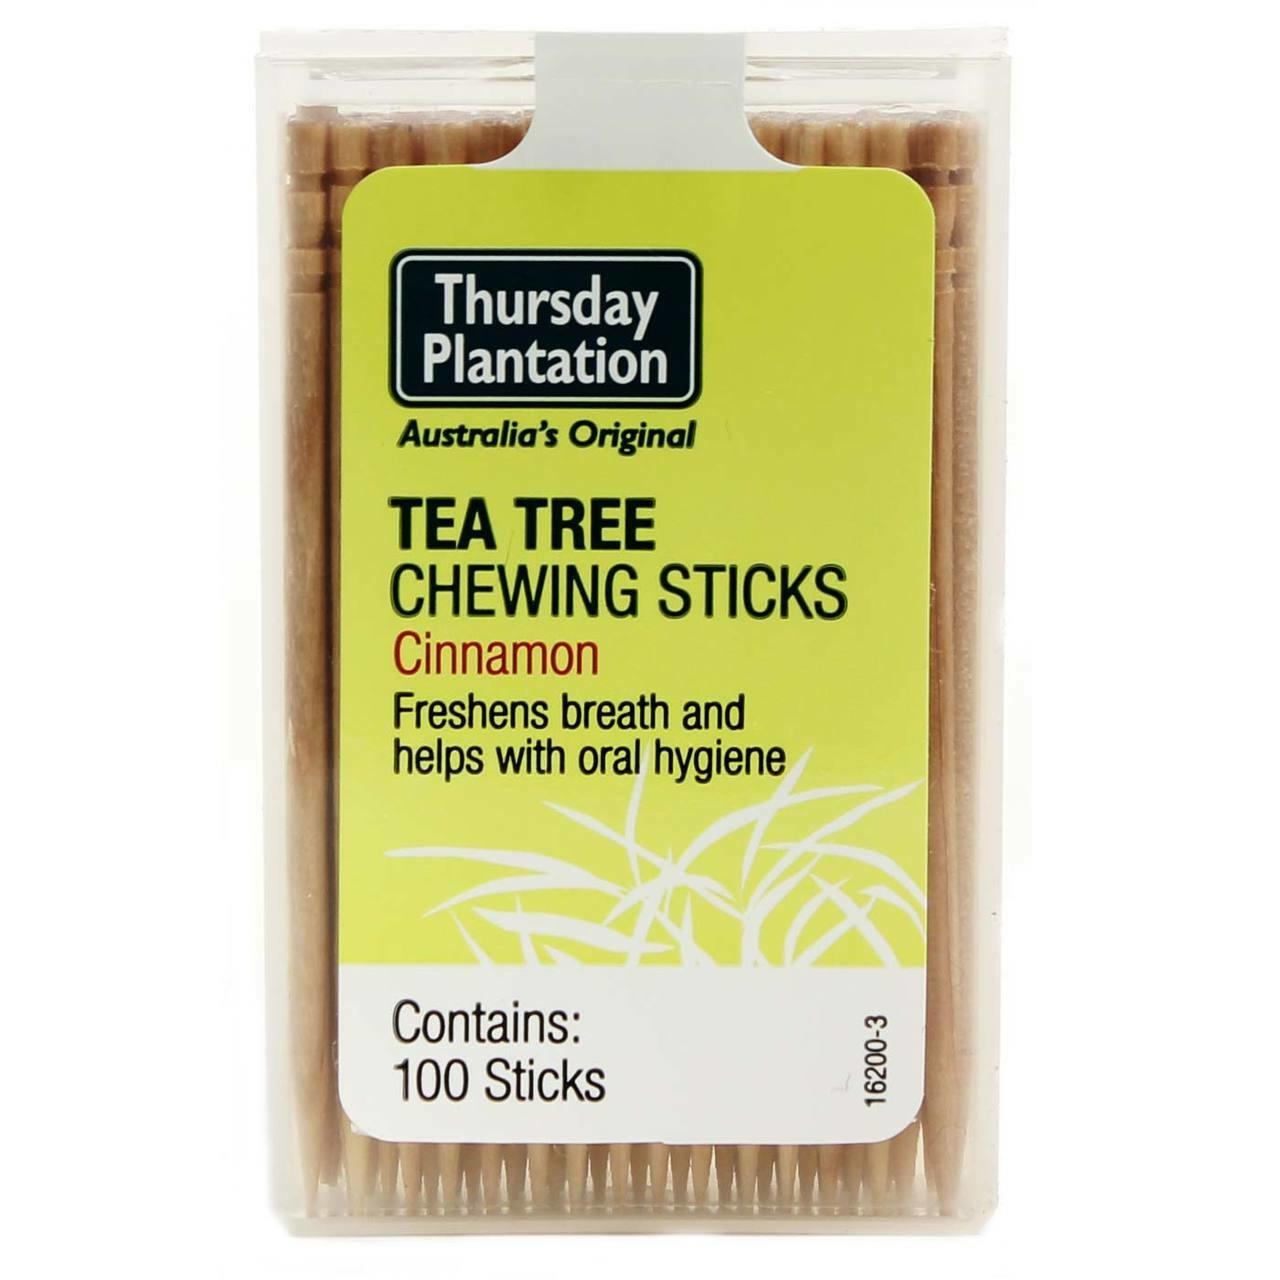 Tea Tree Chewing Sticks - Cinnamon-1